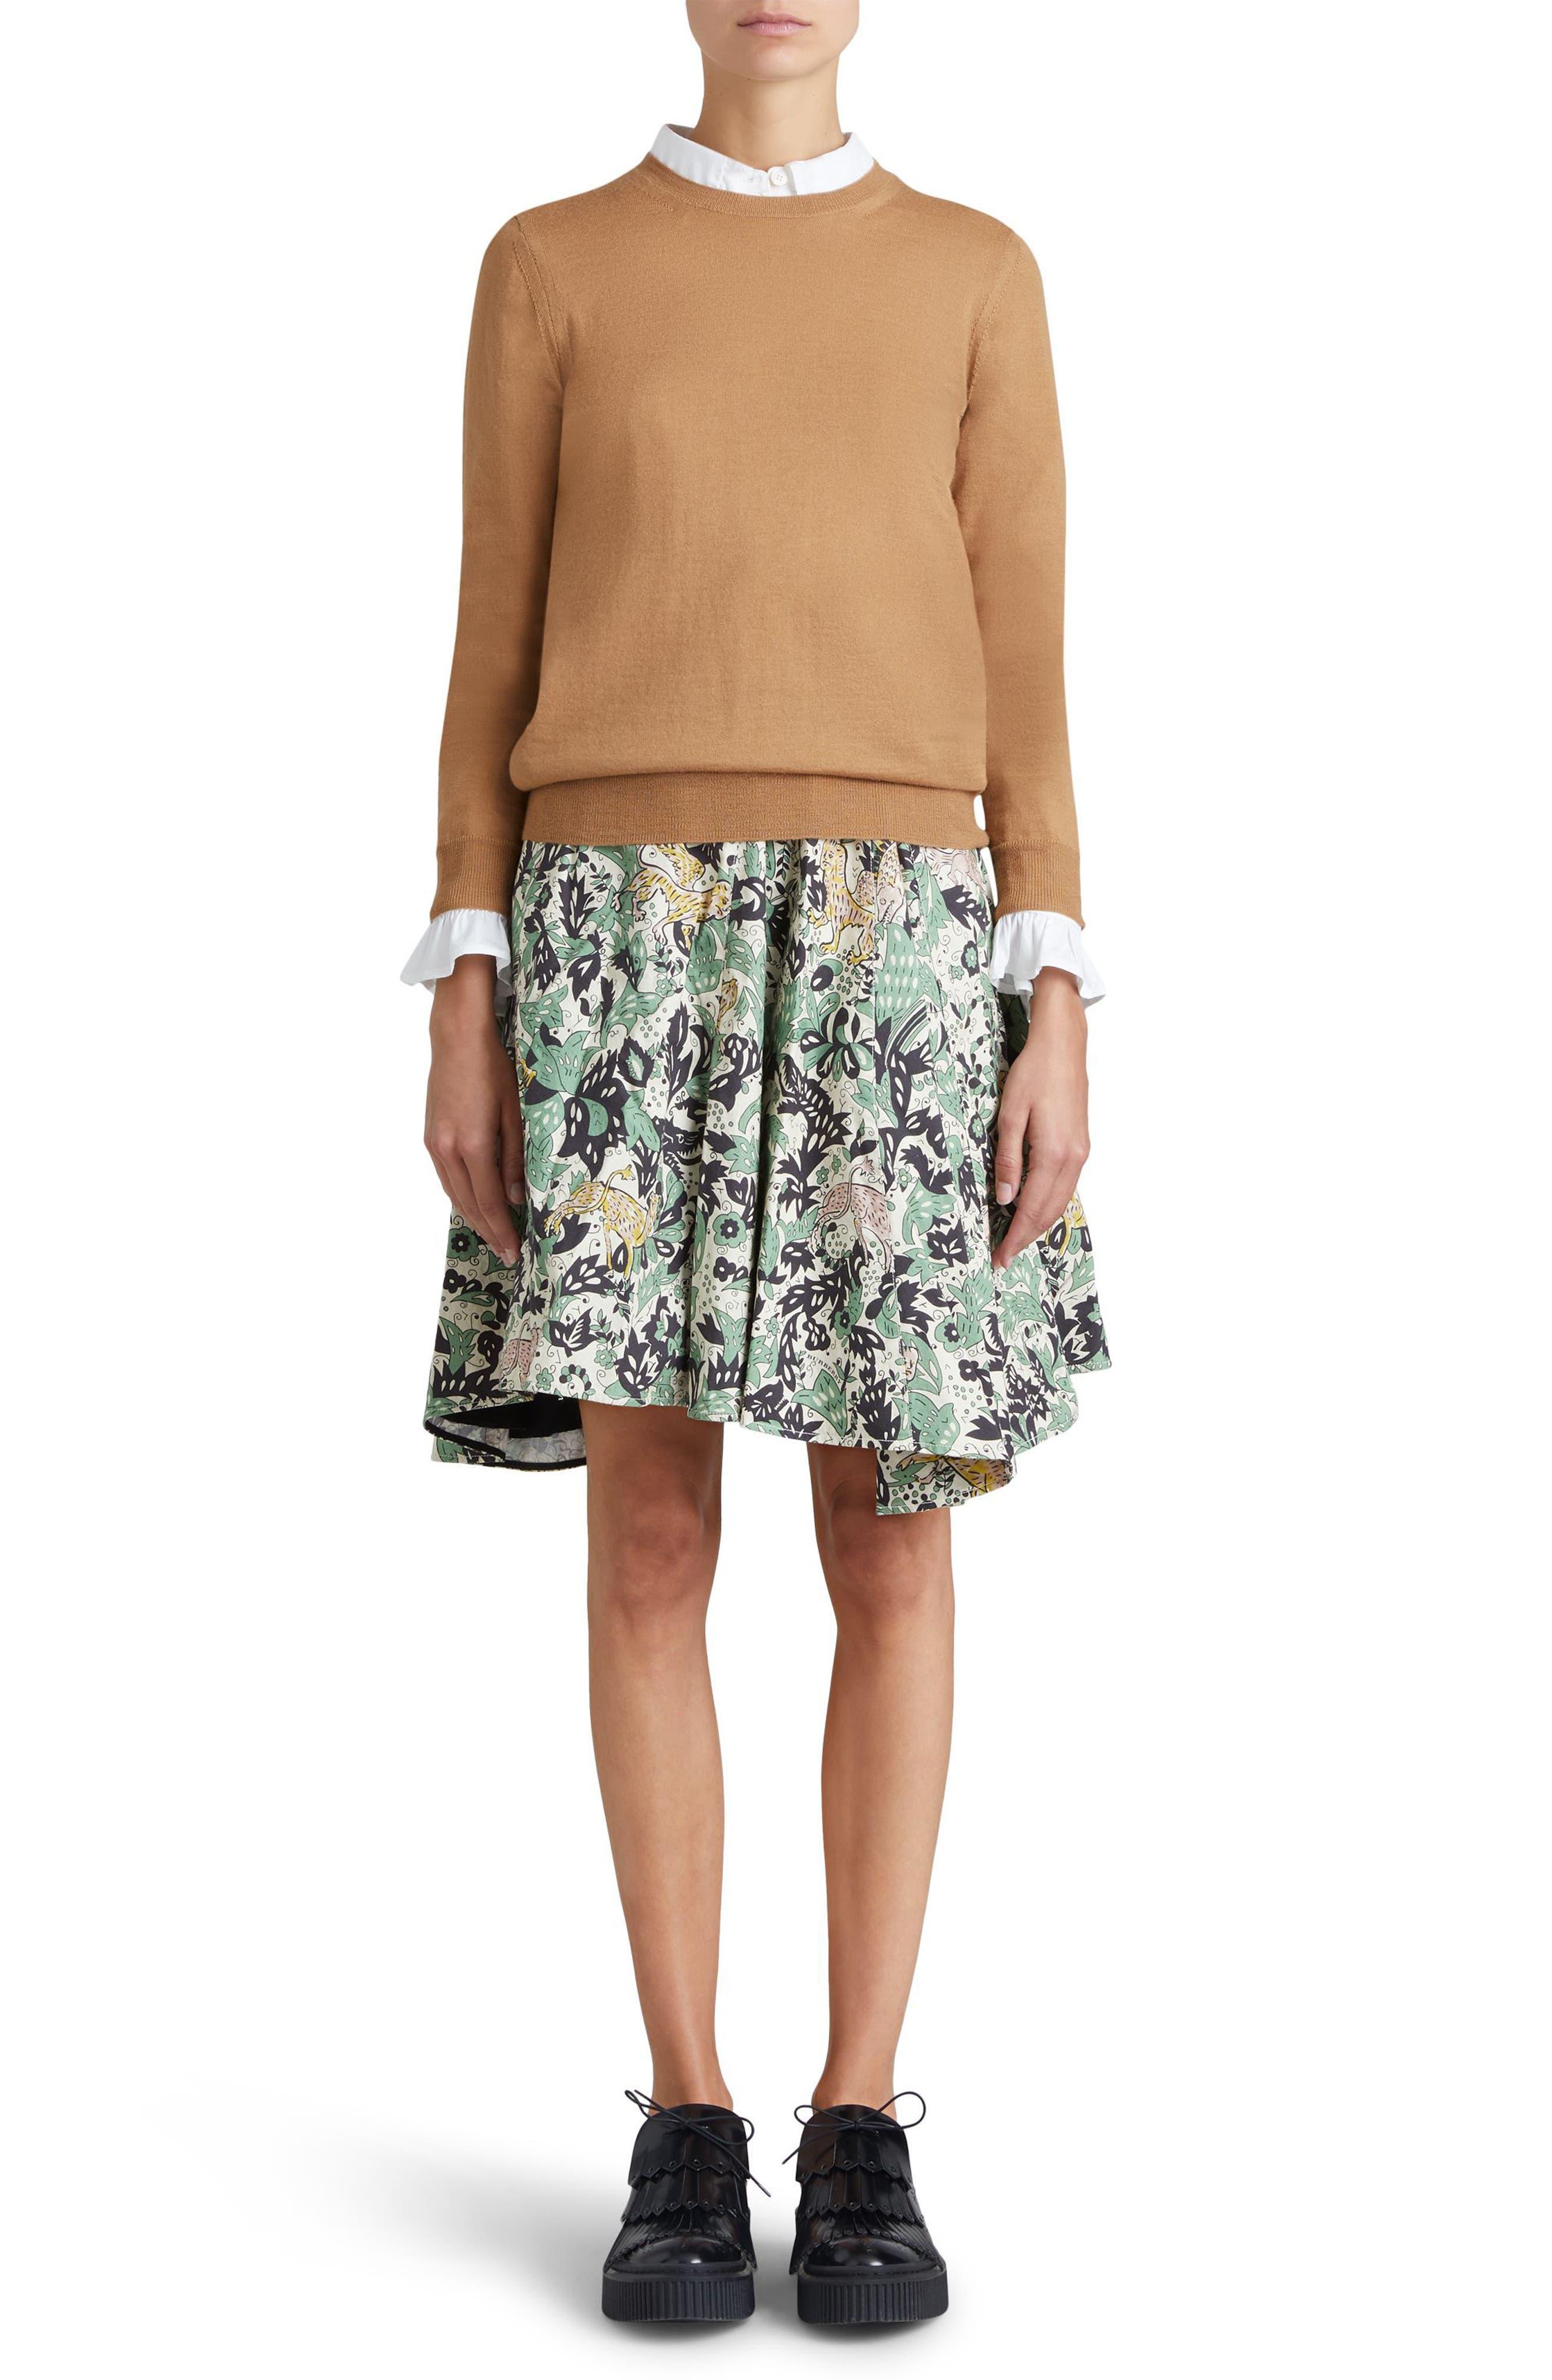 Viar Merino Wool Sweater,                             Alternate thumbnail 5, color,                             Camel